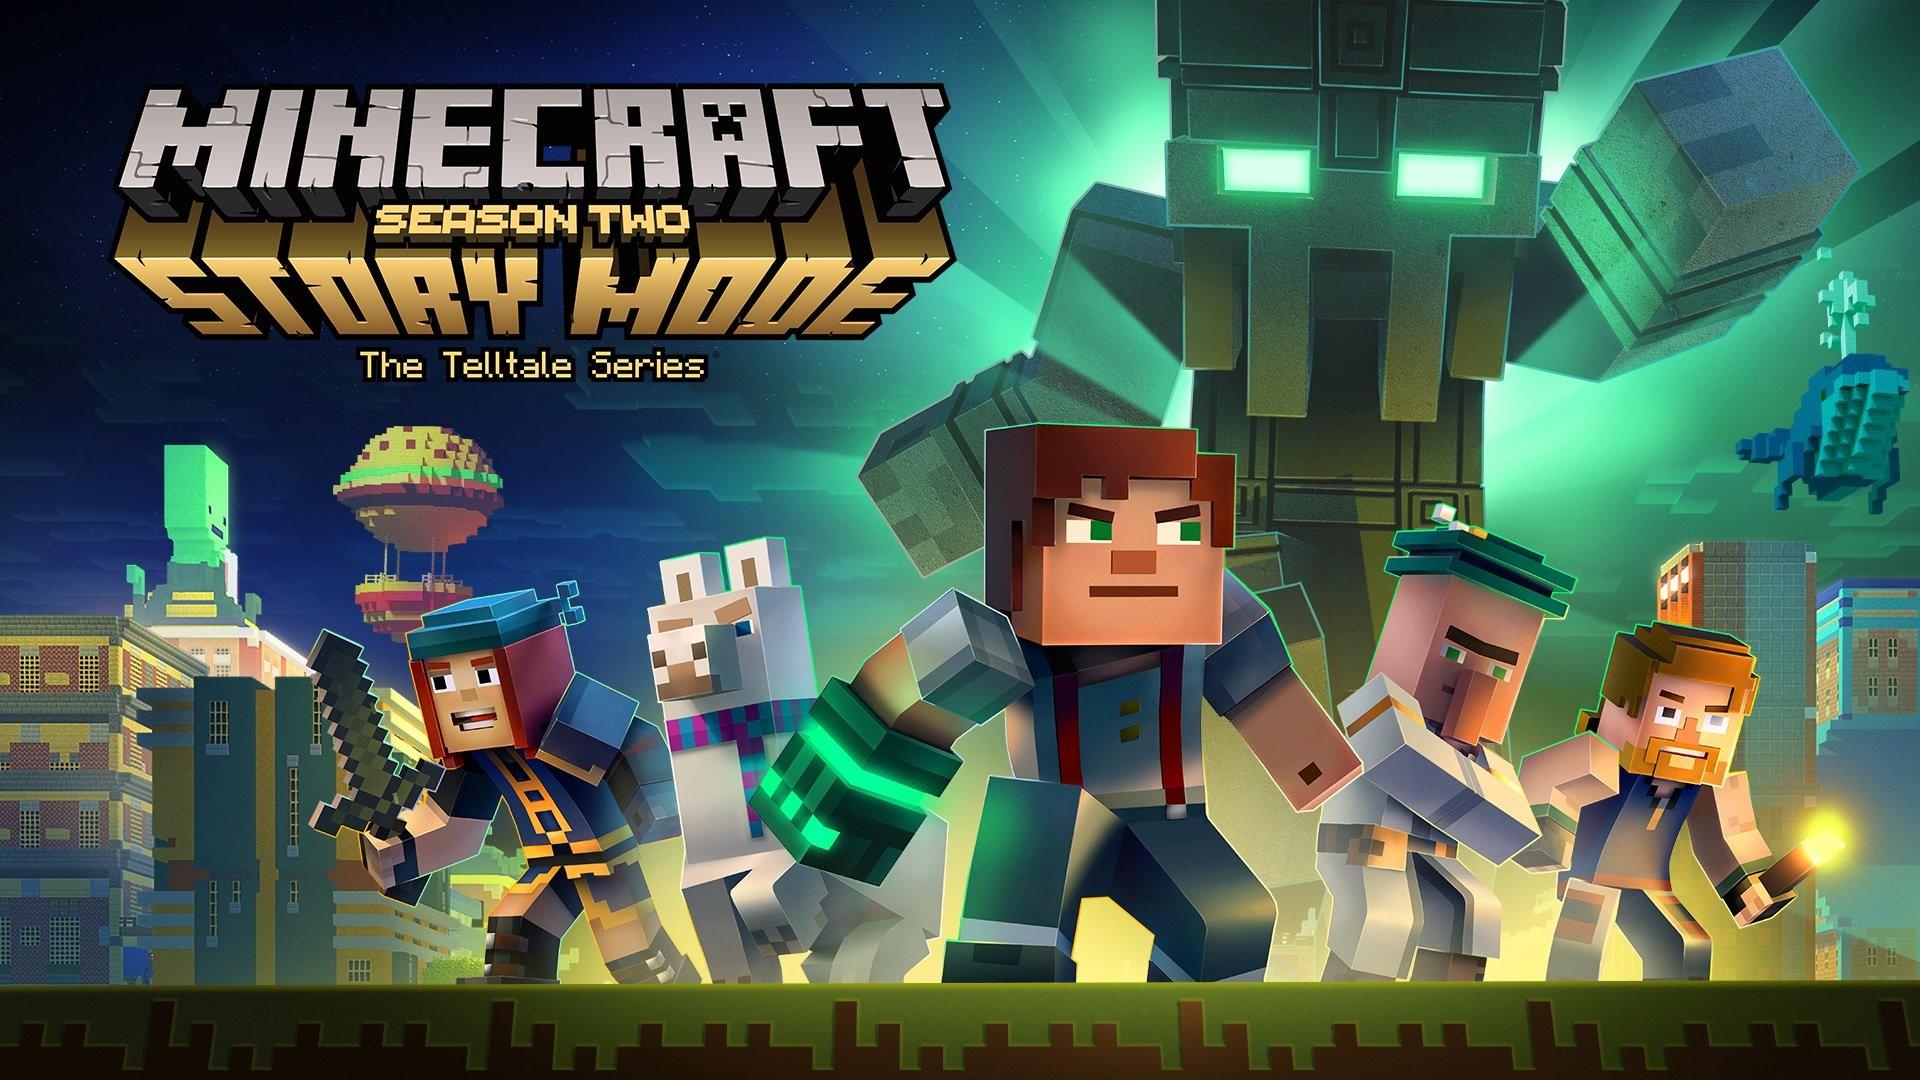 Вышел трейлер четвёртого эпизода Minecraft: Story Mode — Season 2